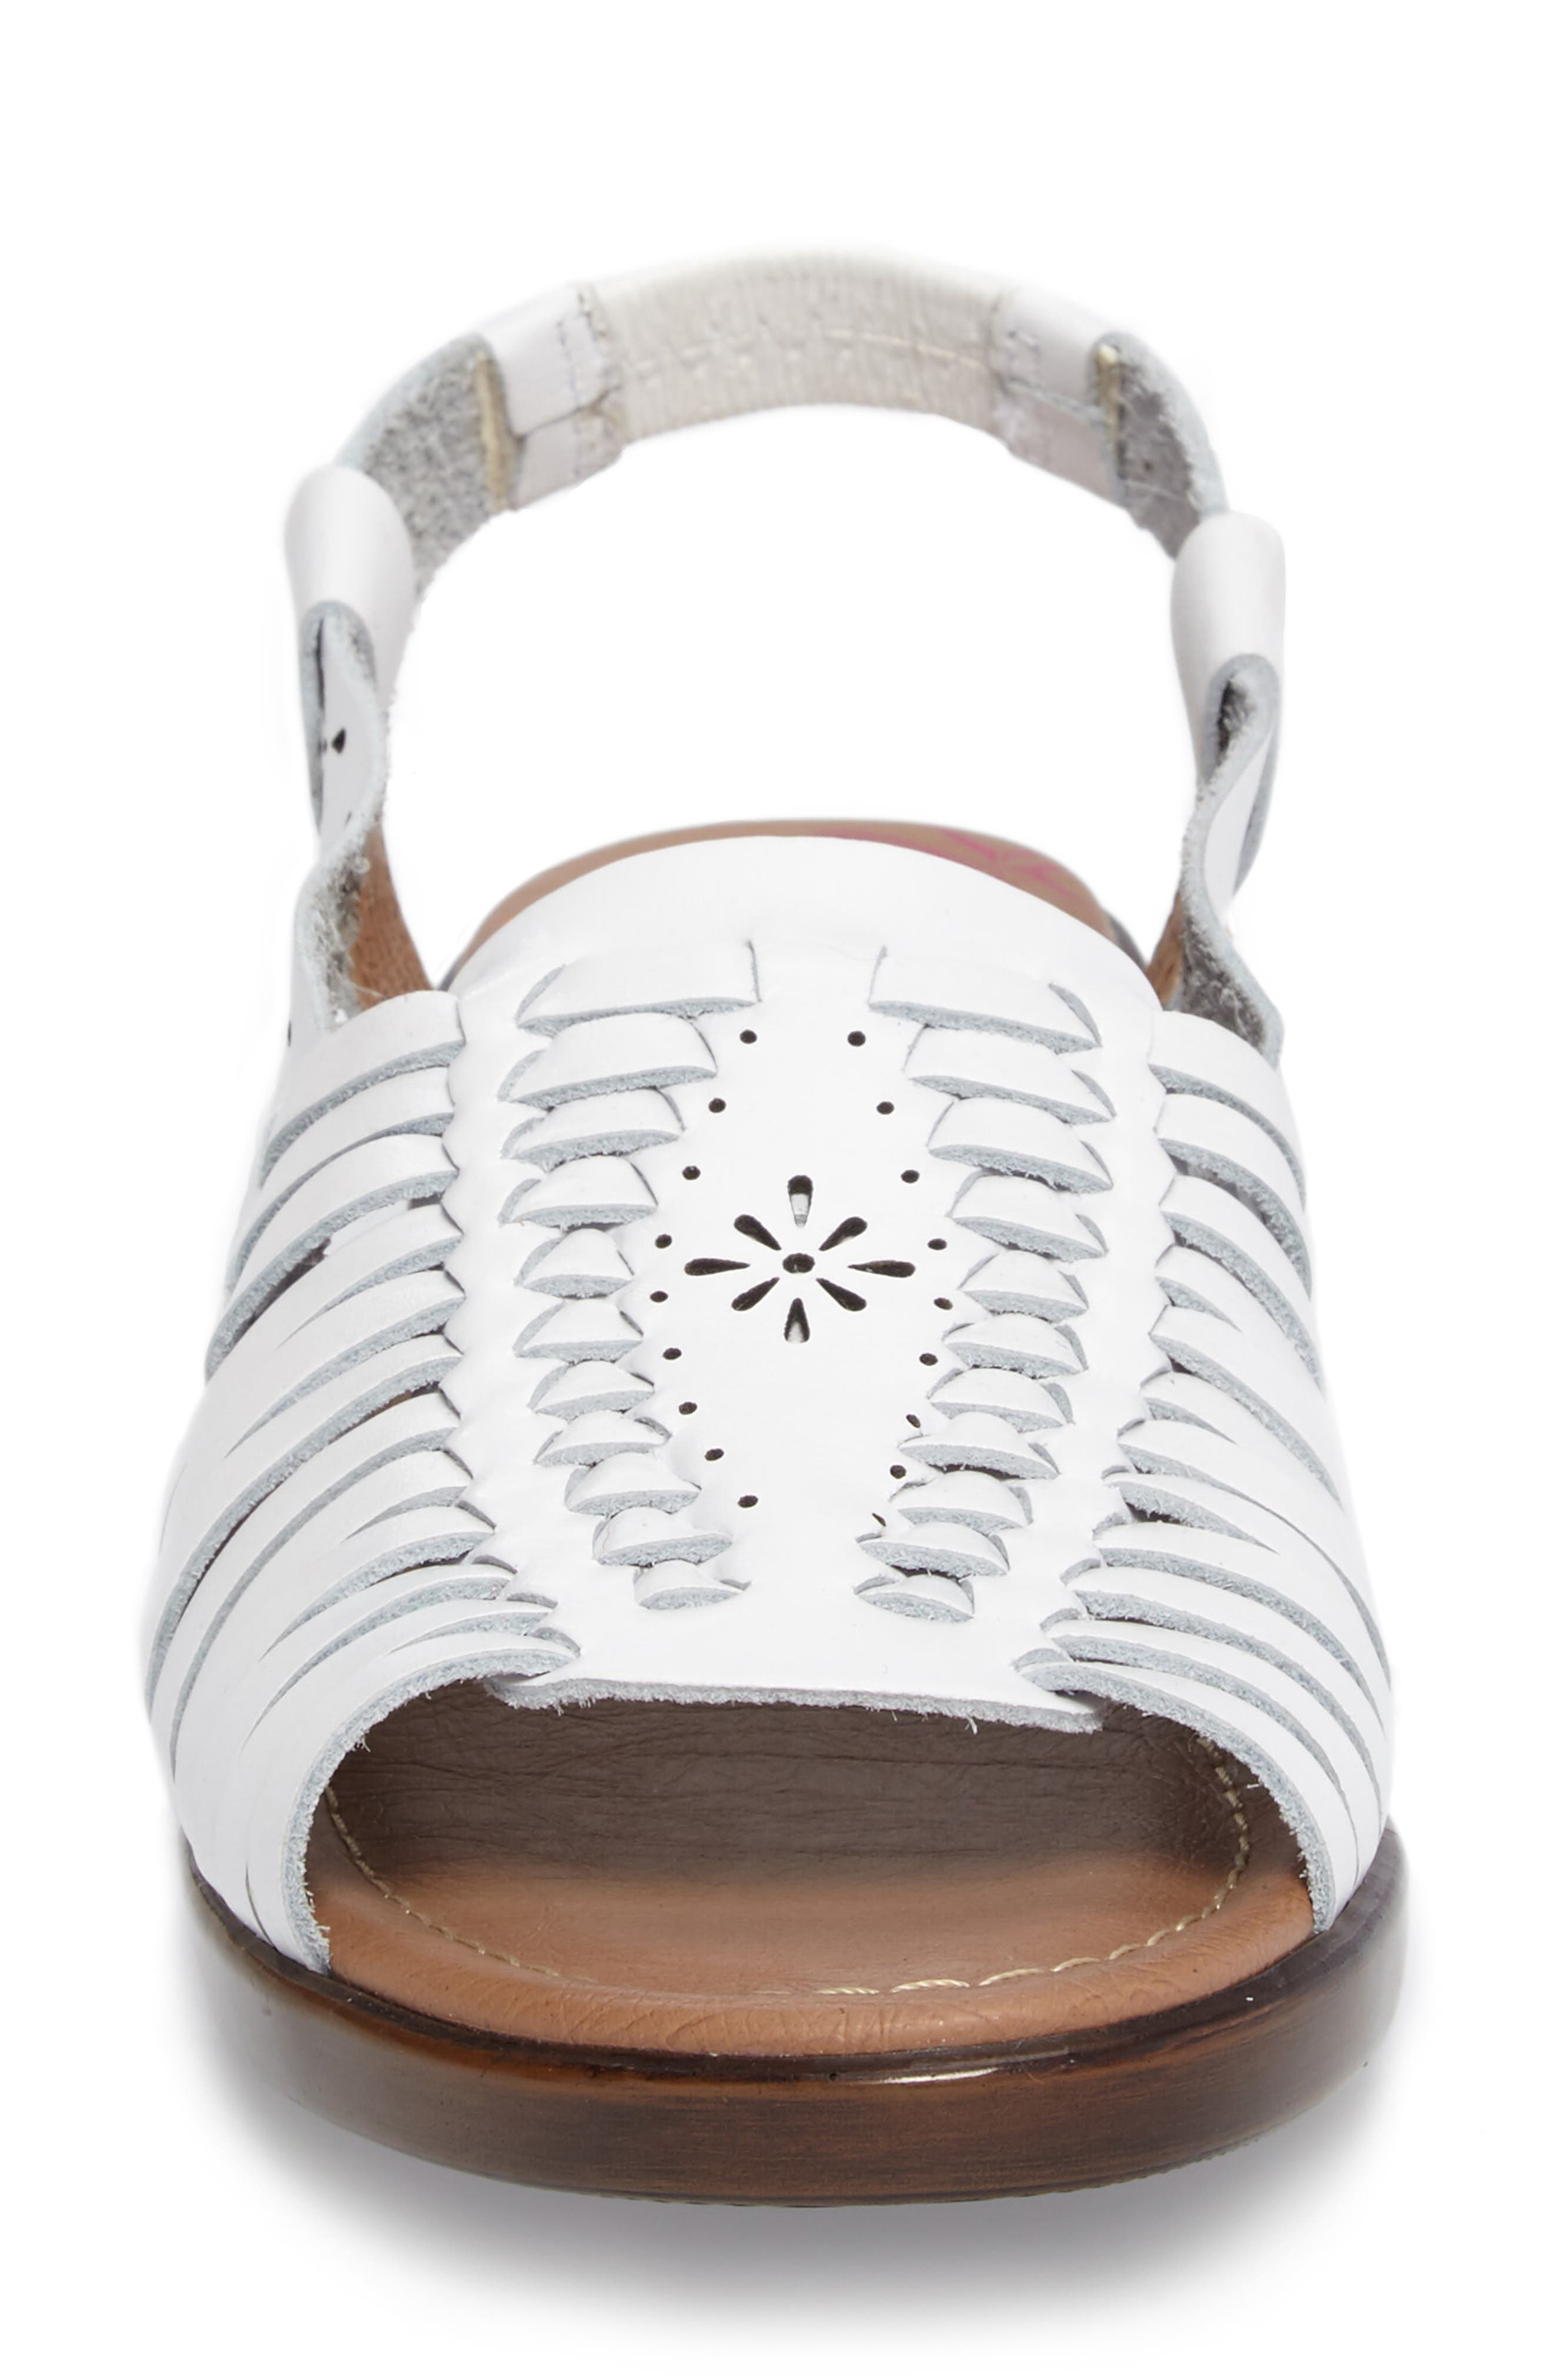 Formasa Huarache Slingback Sandal,                             Alternate thumbnail 4, color,                             100